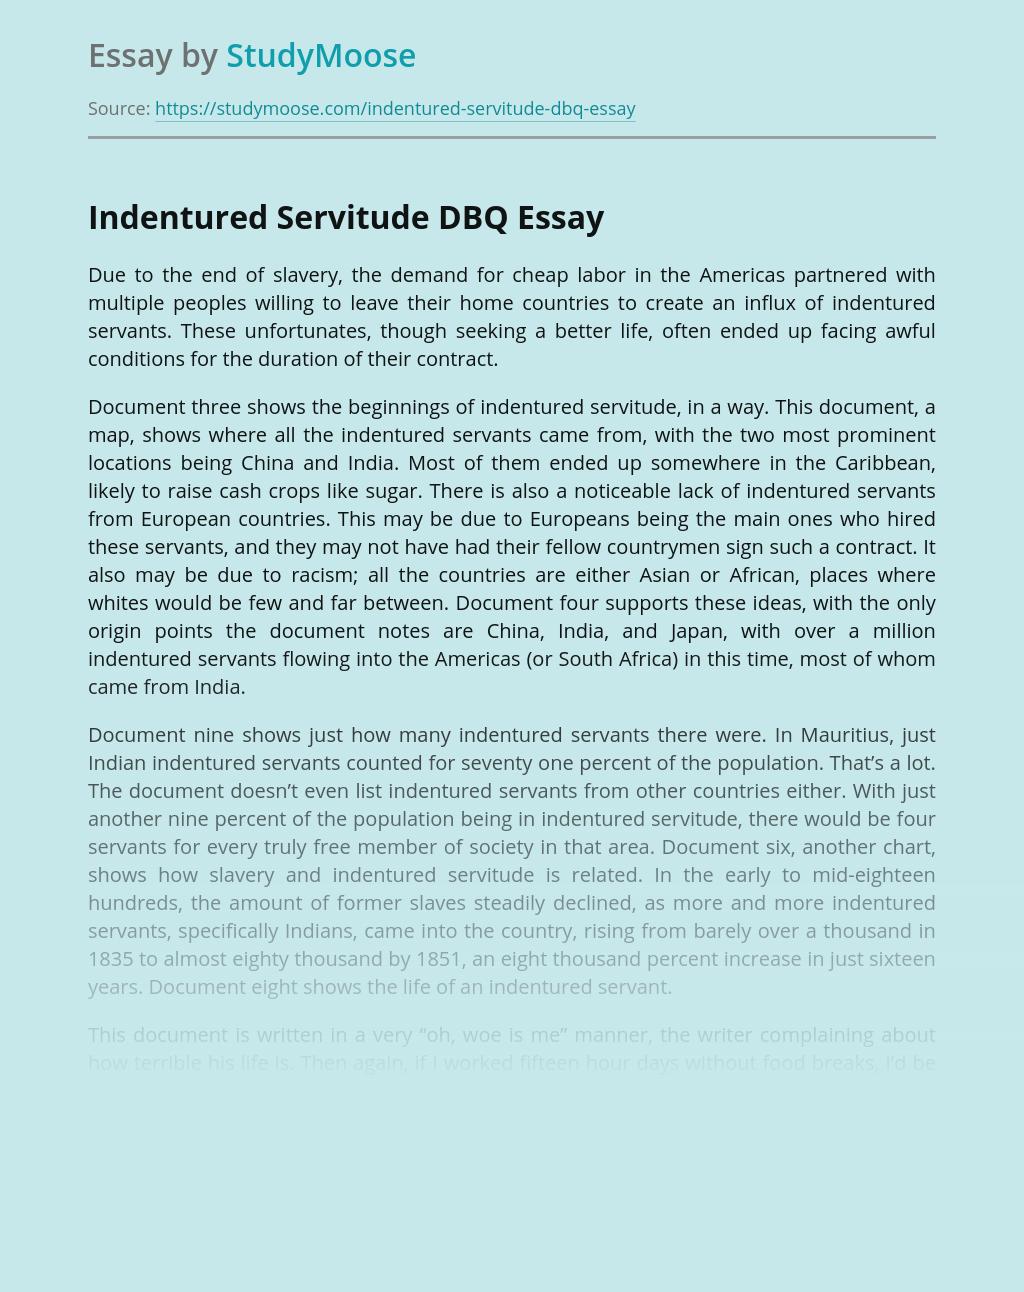 Indentured Servitude in History